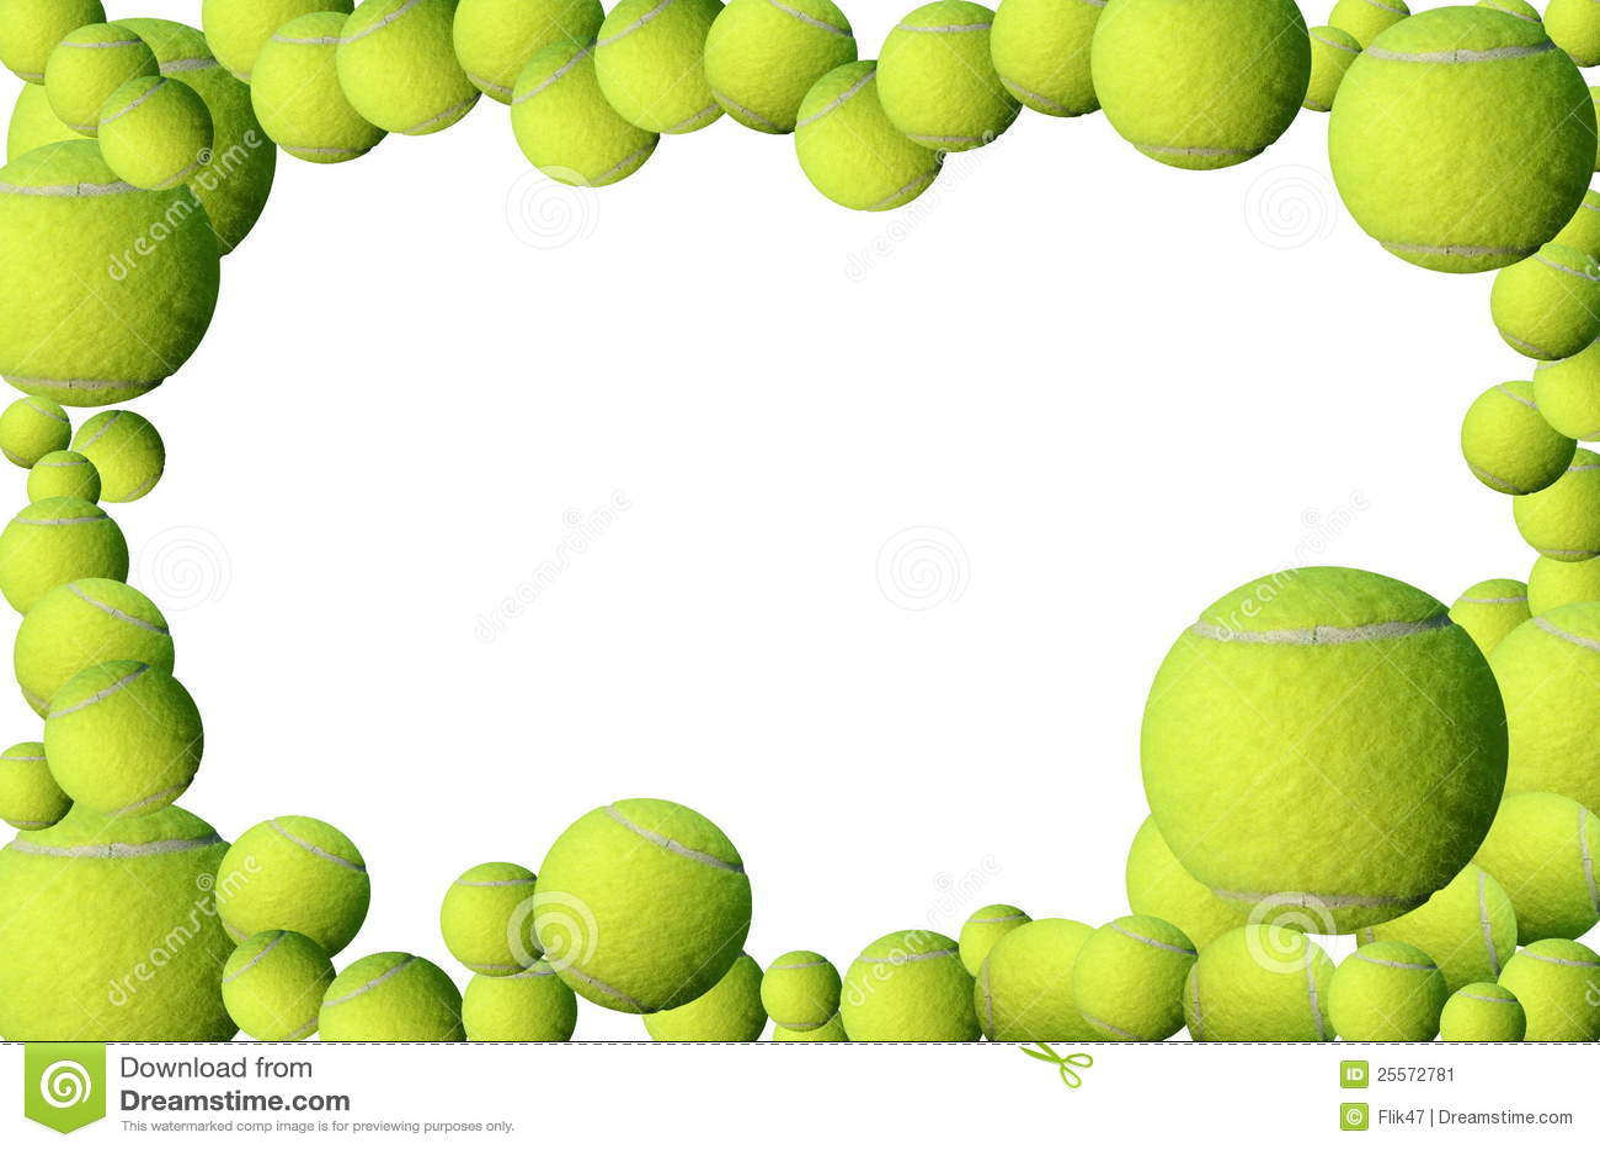 tennis balls frame easy - photo #32